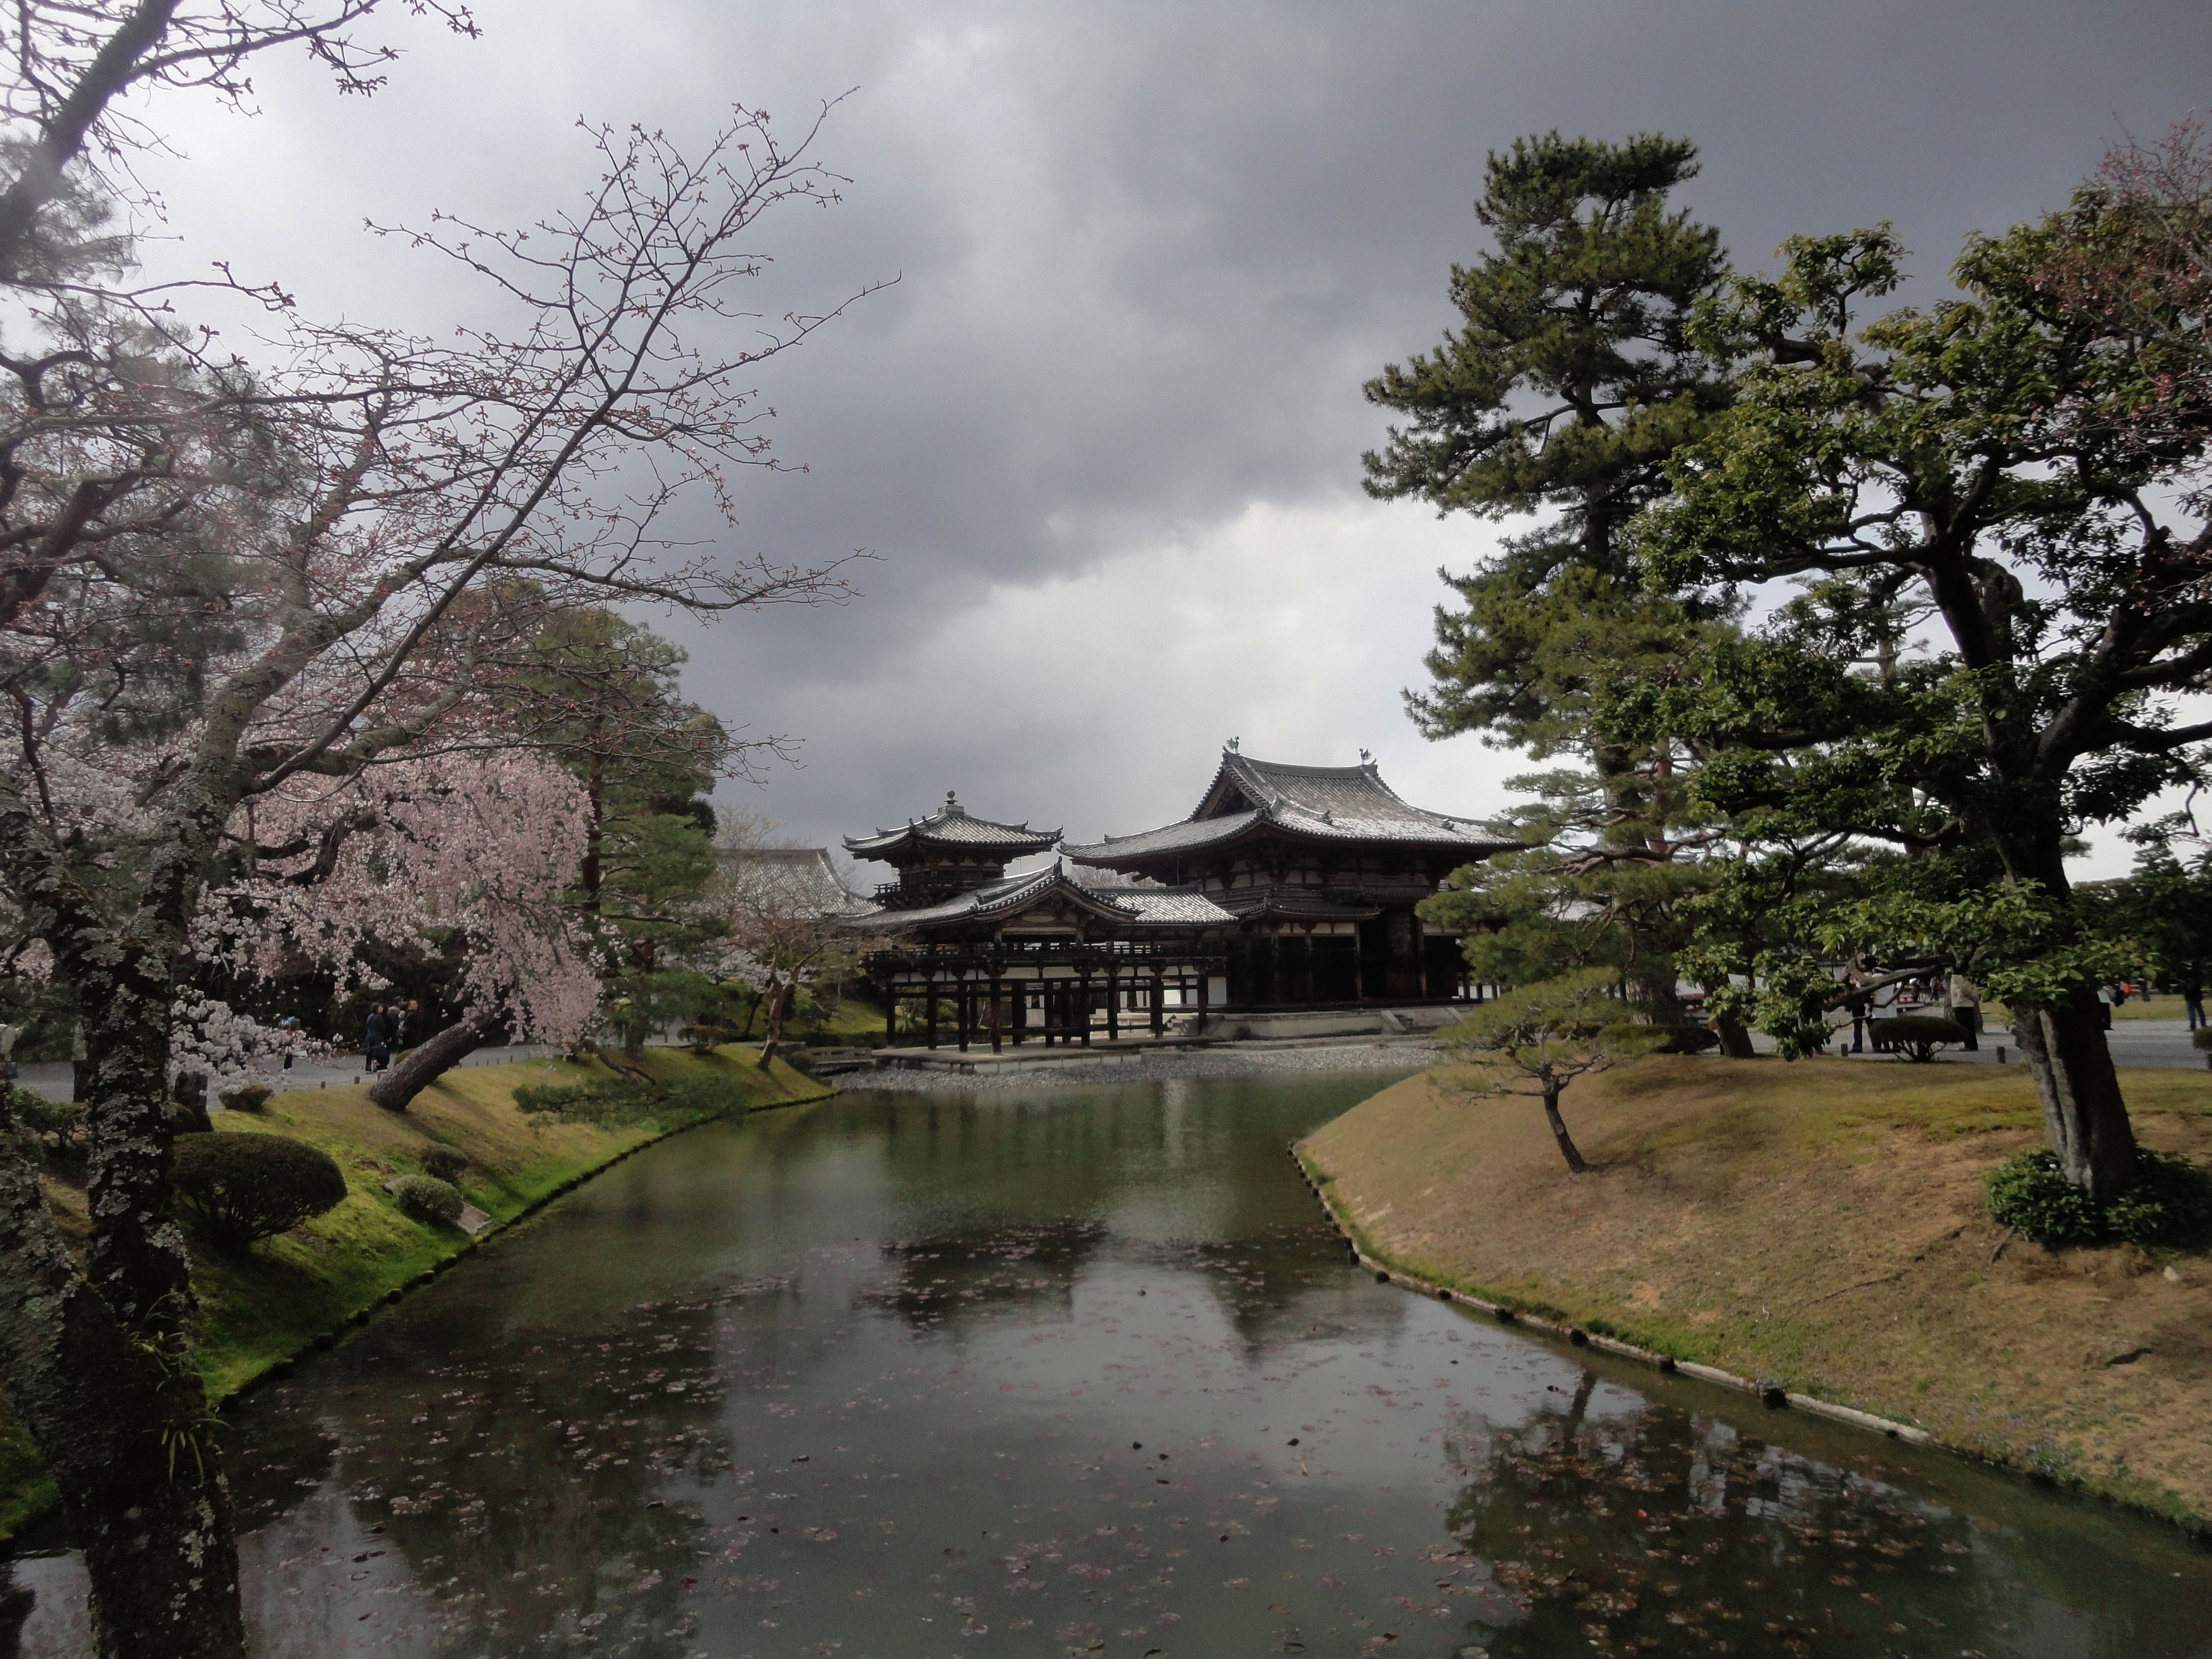 Byodo in temple Jodo shiki garden walkway facing Phoenix Hall Kyoto Japan 01